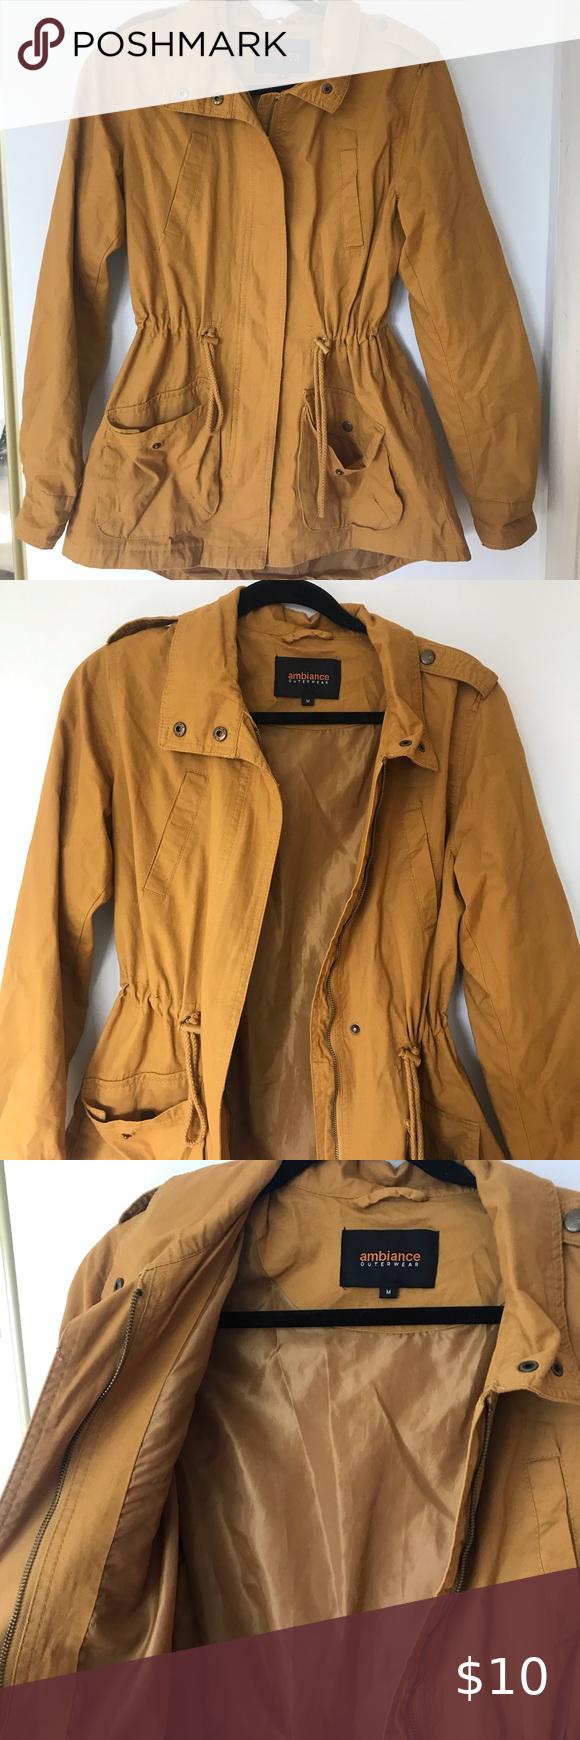 Yellow Jacket Jackets Outerwear Jackets Clothes Design [ 1740 x 580 Pixel ]